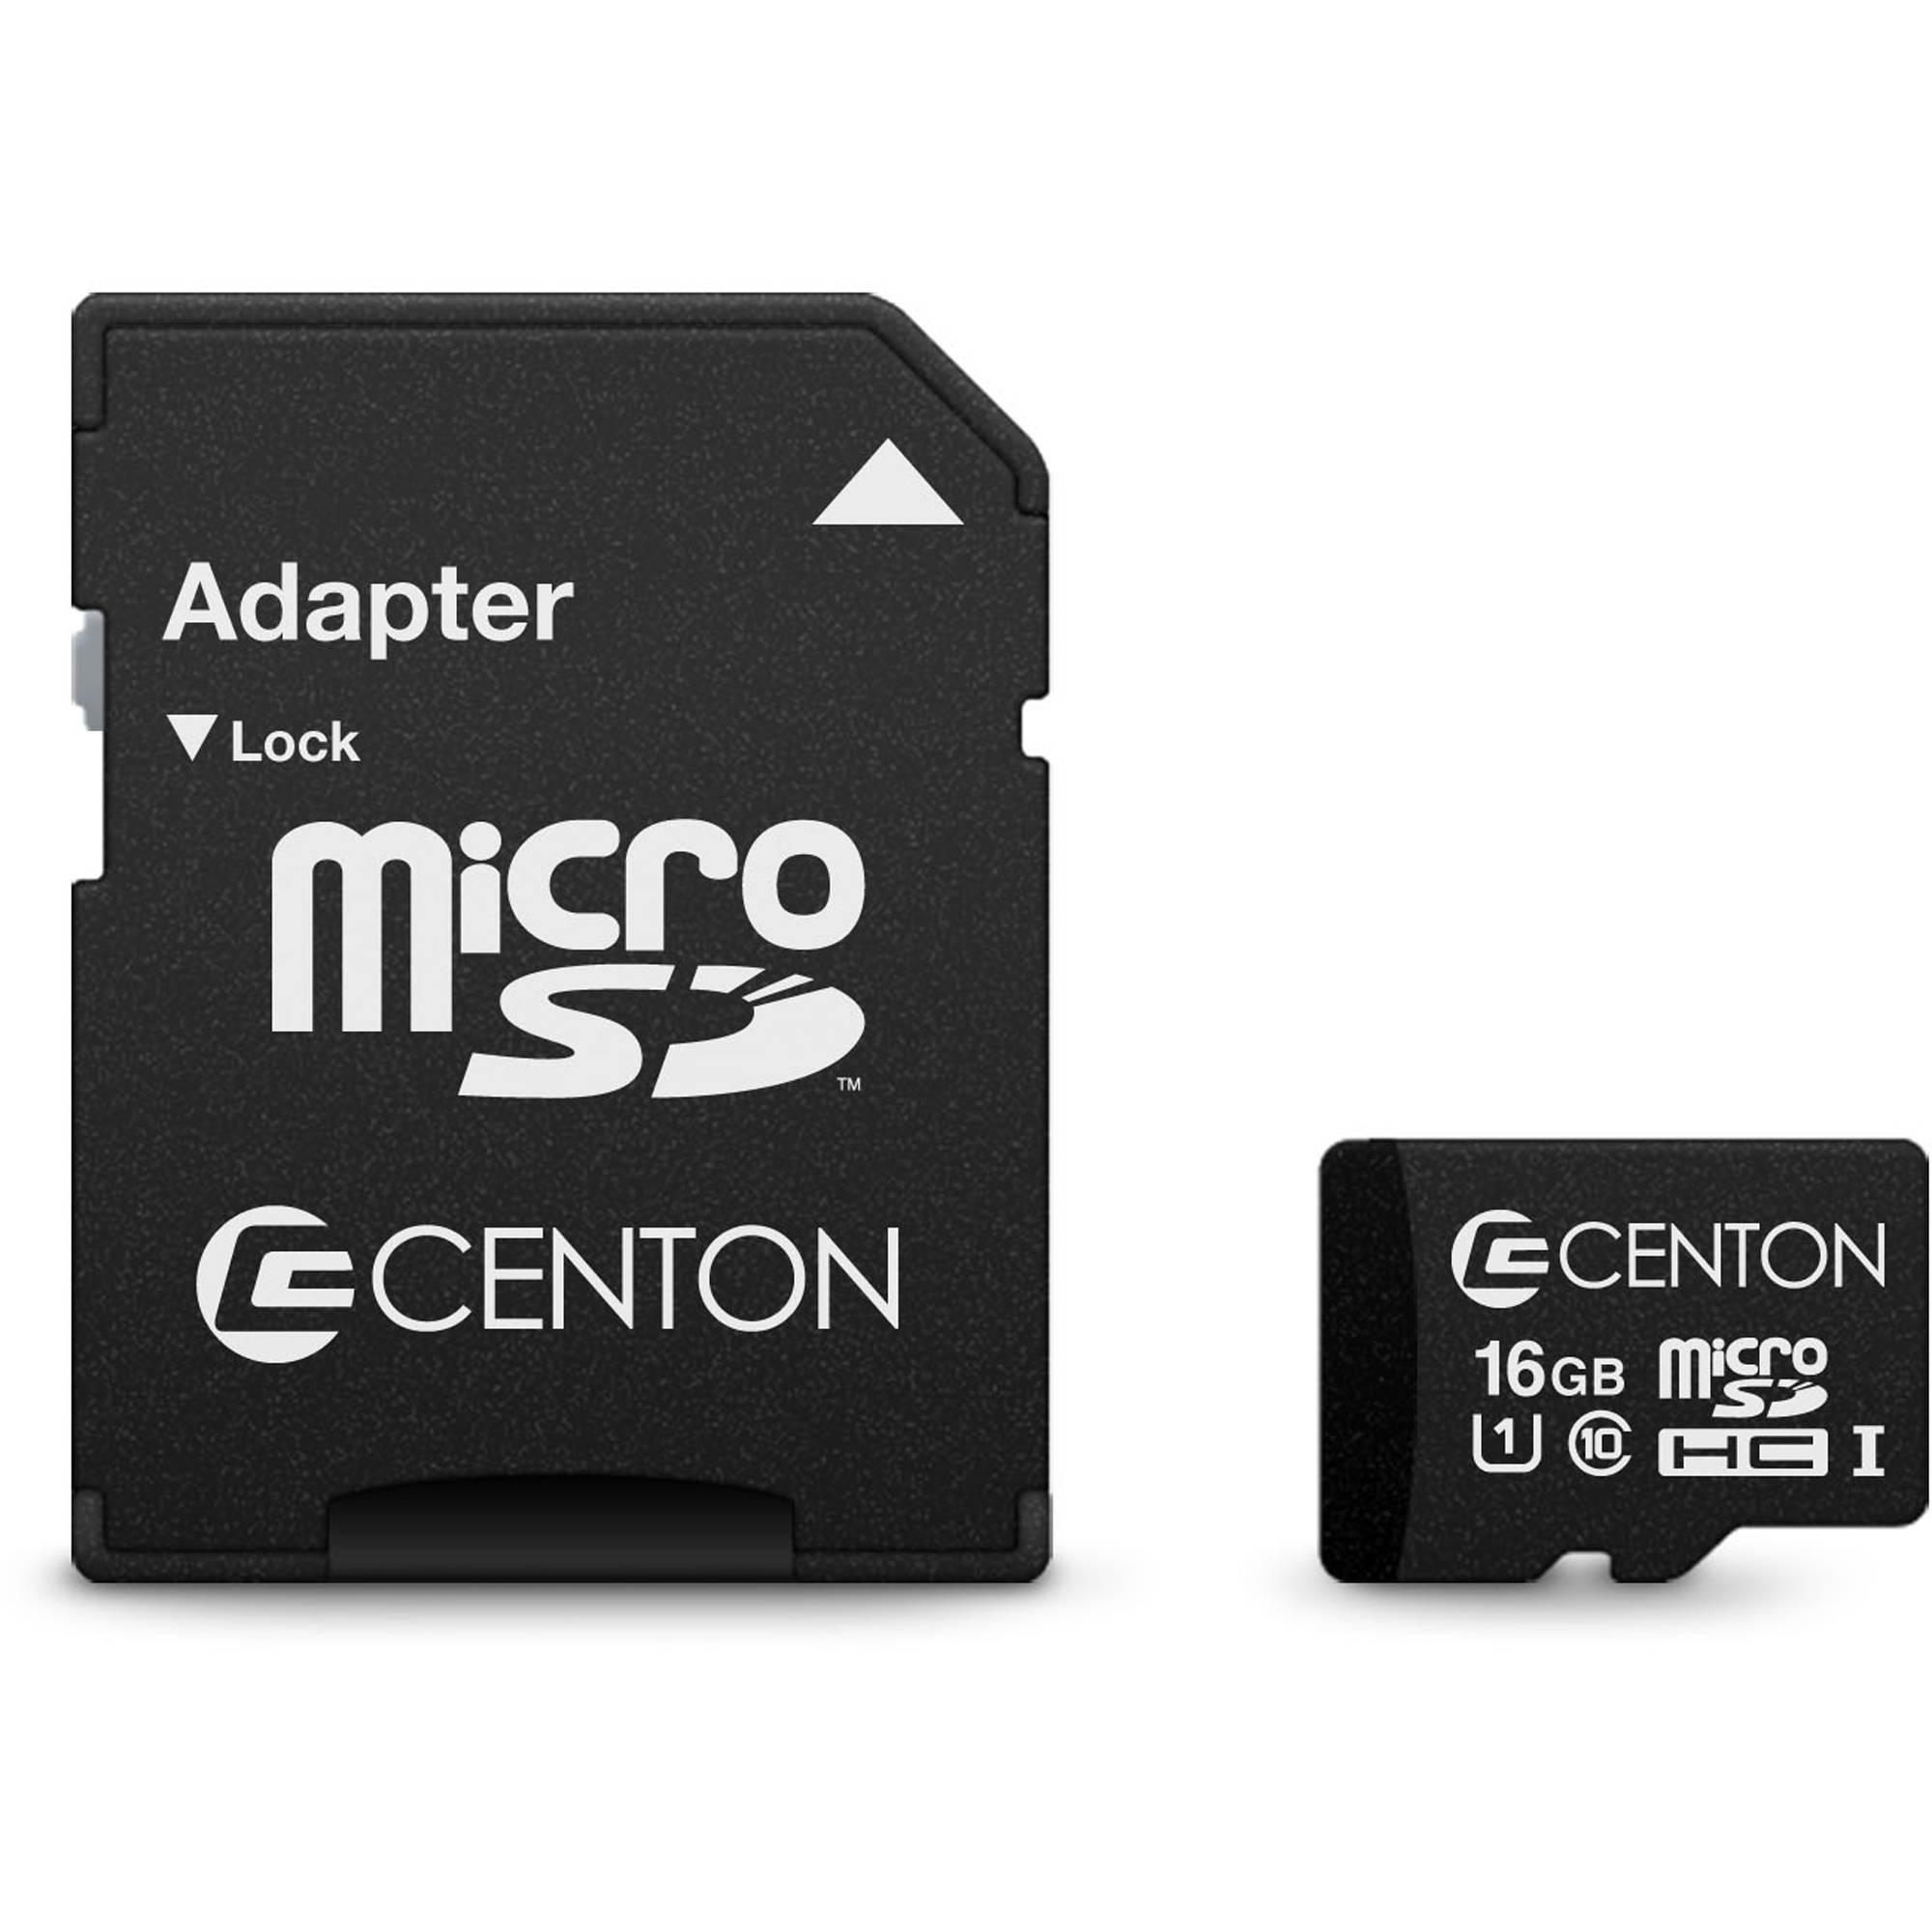 Centon 16GB Class 10 UHS-I microSD Card